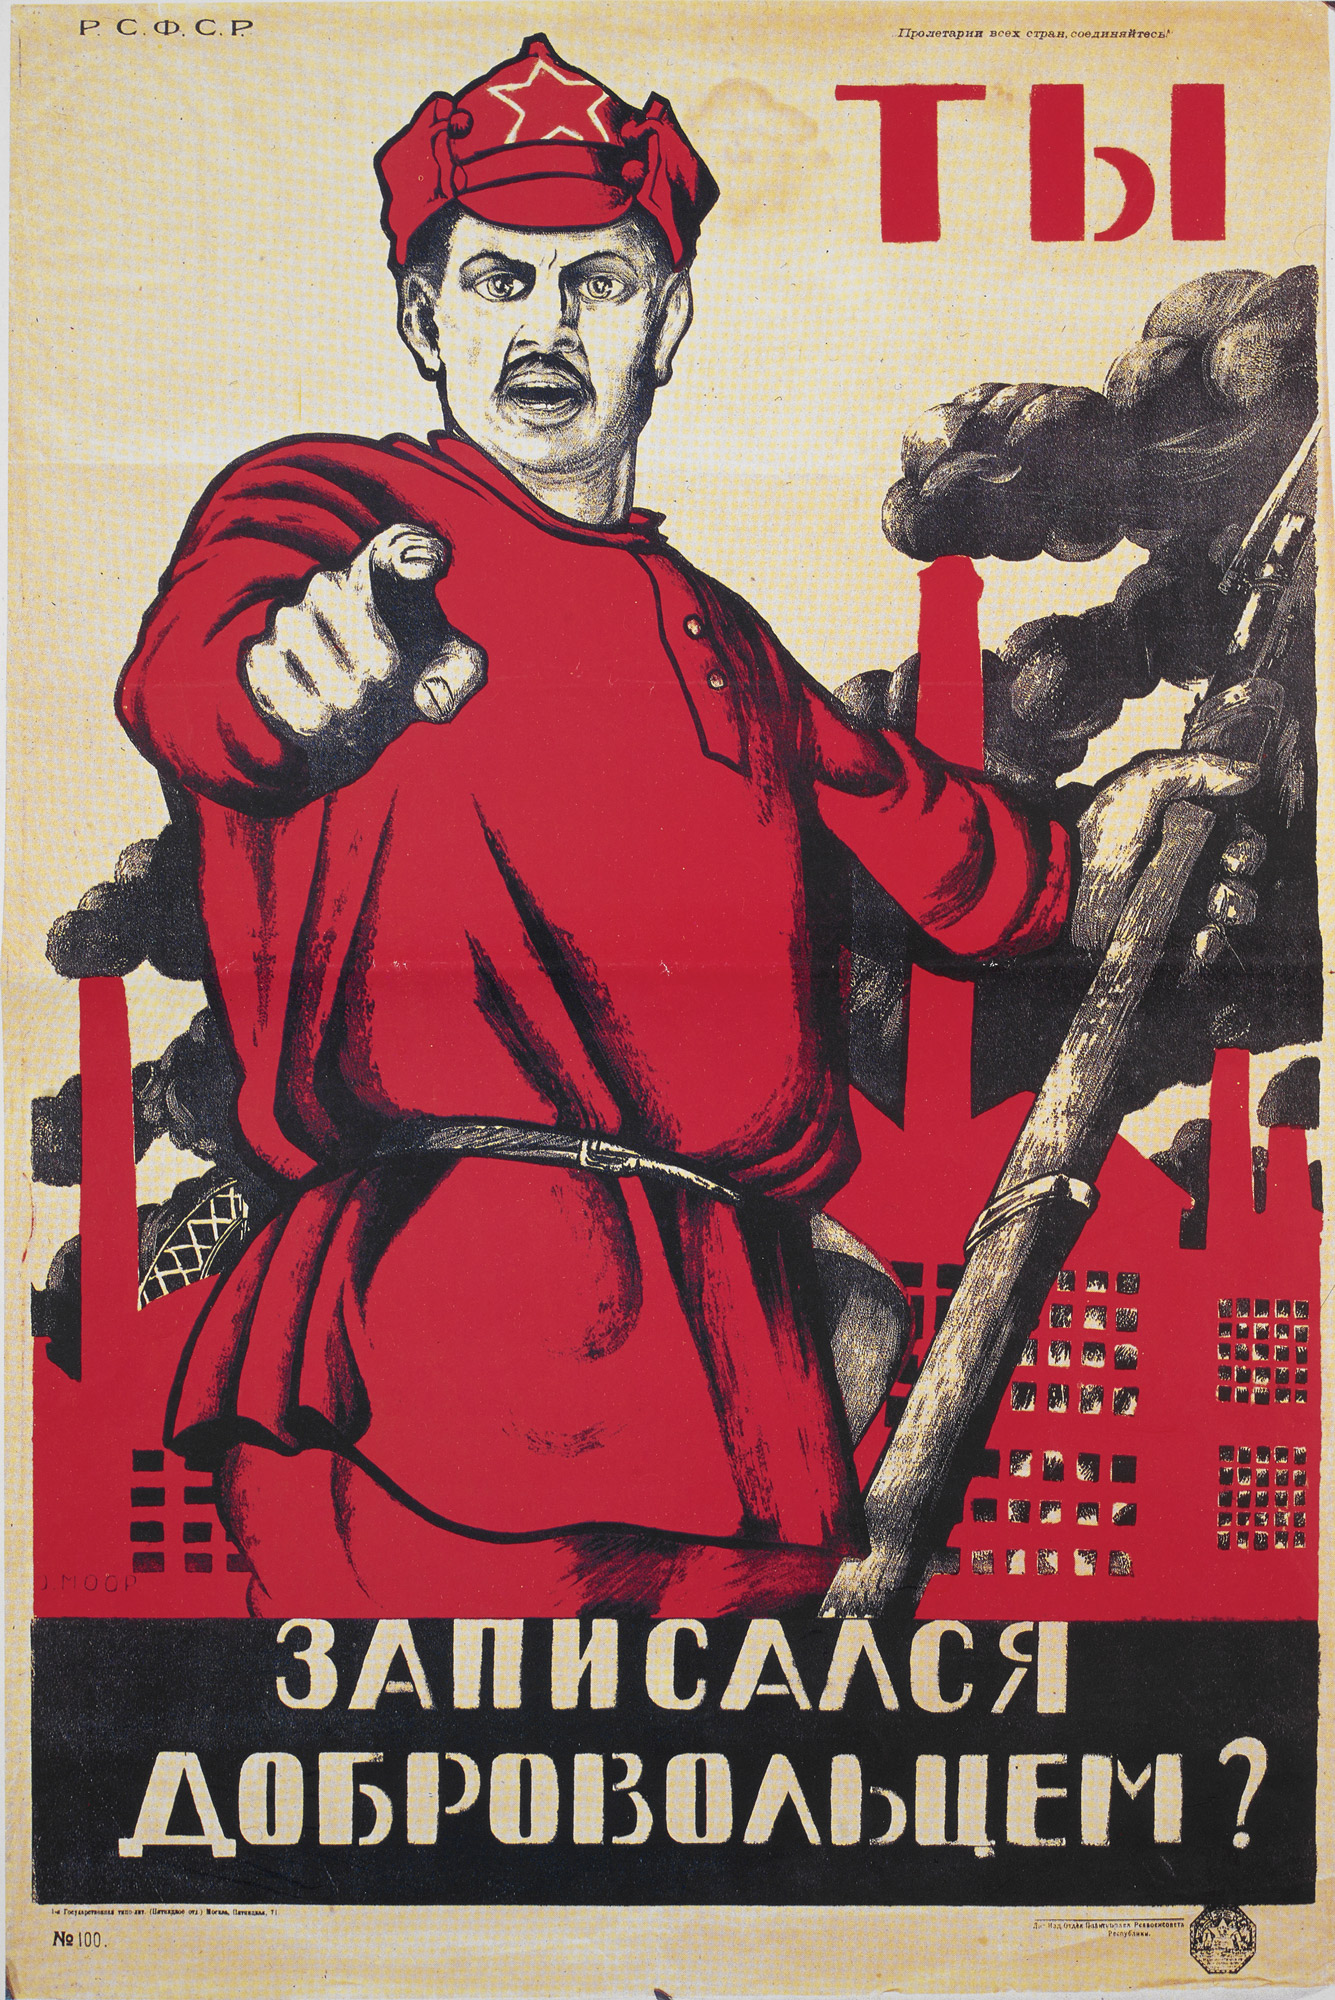 Russian Revolution propaganda poster